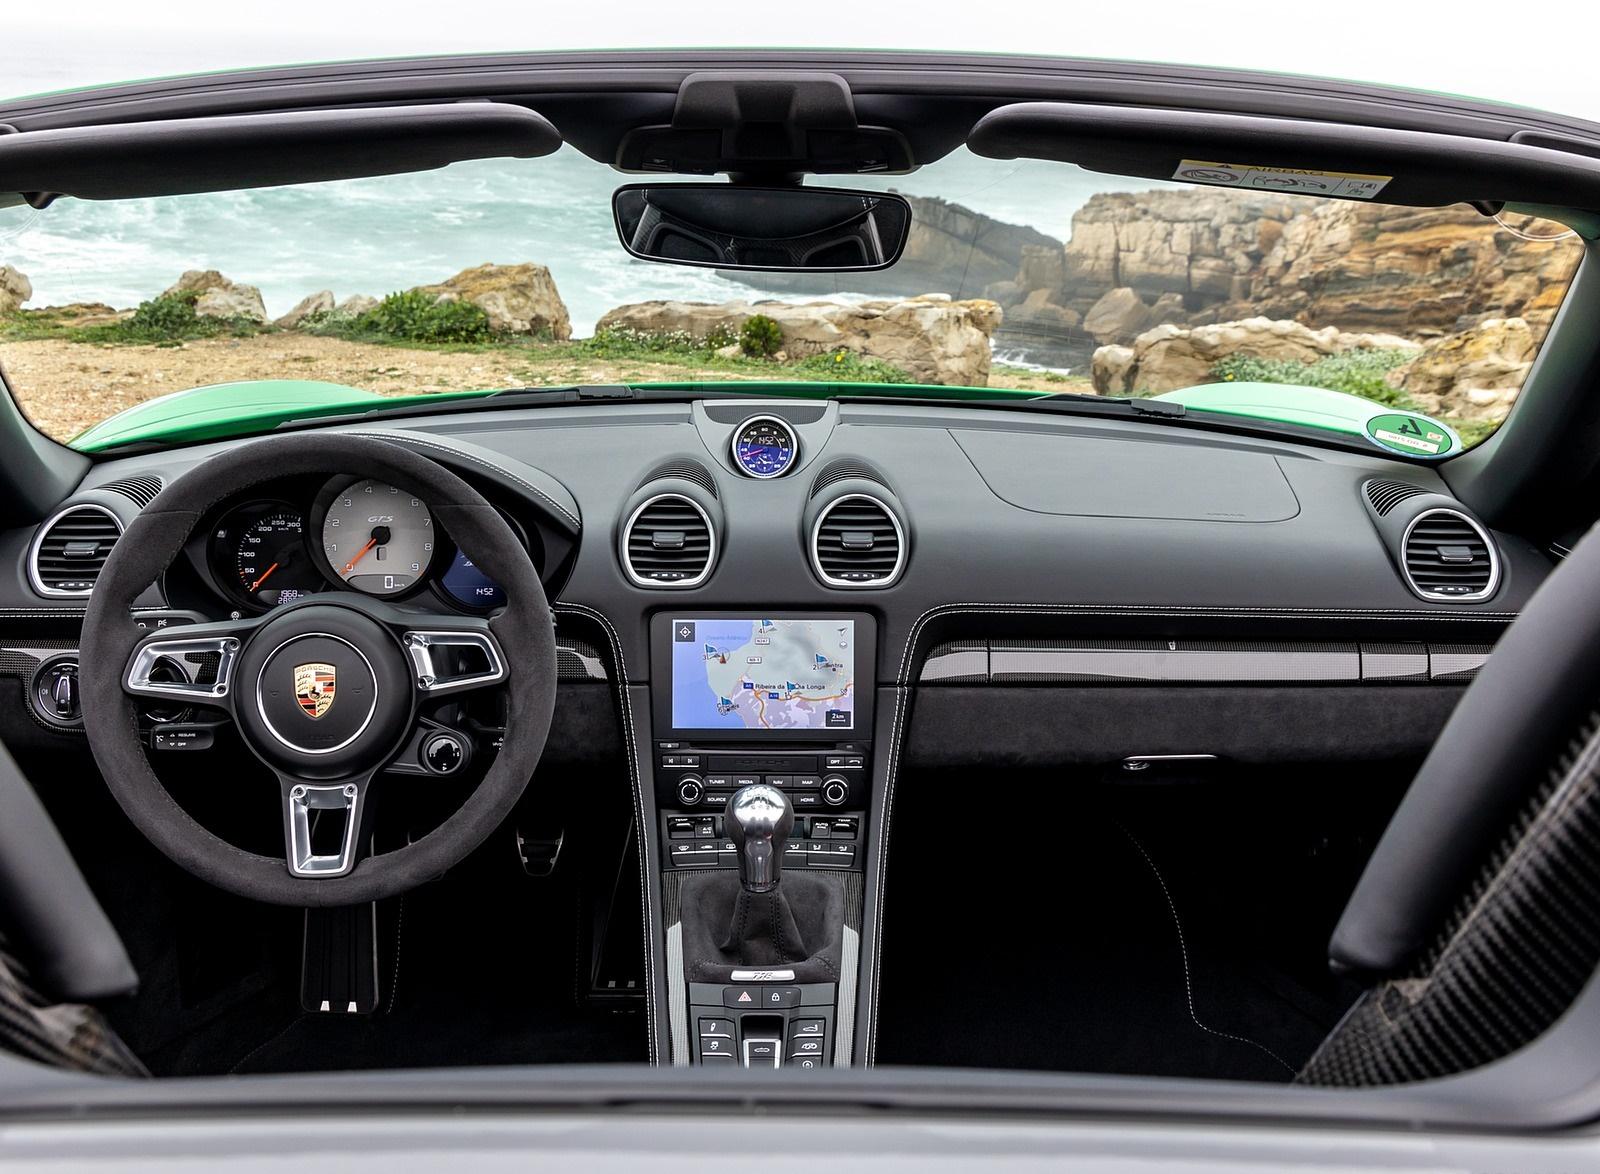 2020 Porsche 718 Boxster Gts 4 0 Color Phyton Green Interior Cockpit Wallpapers 54 Newcarcars